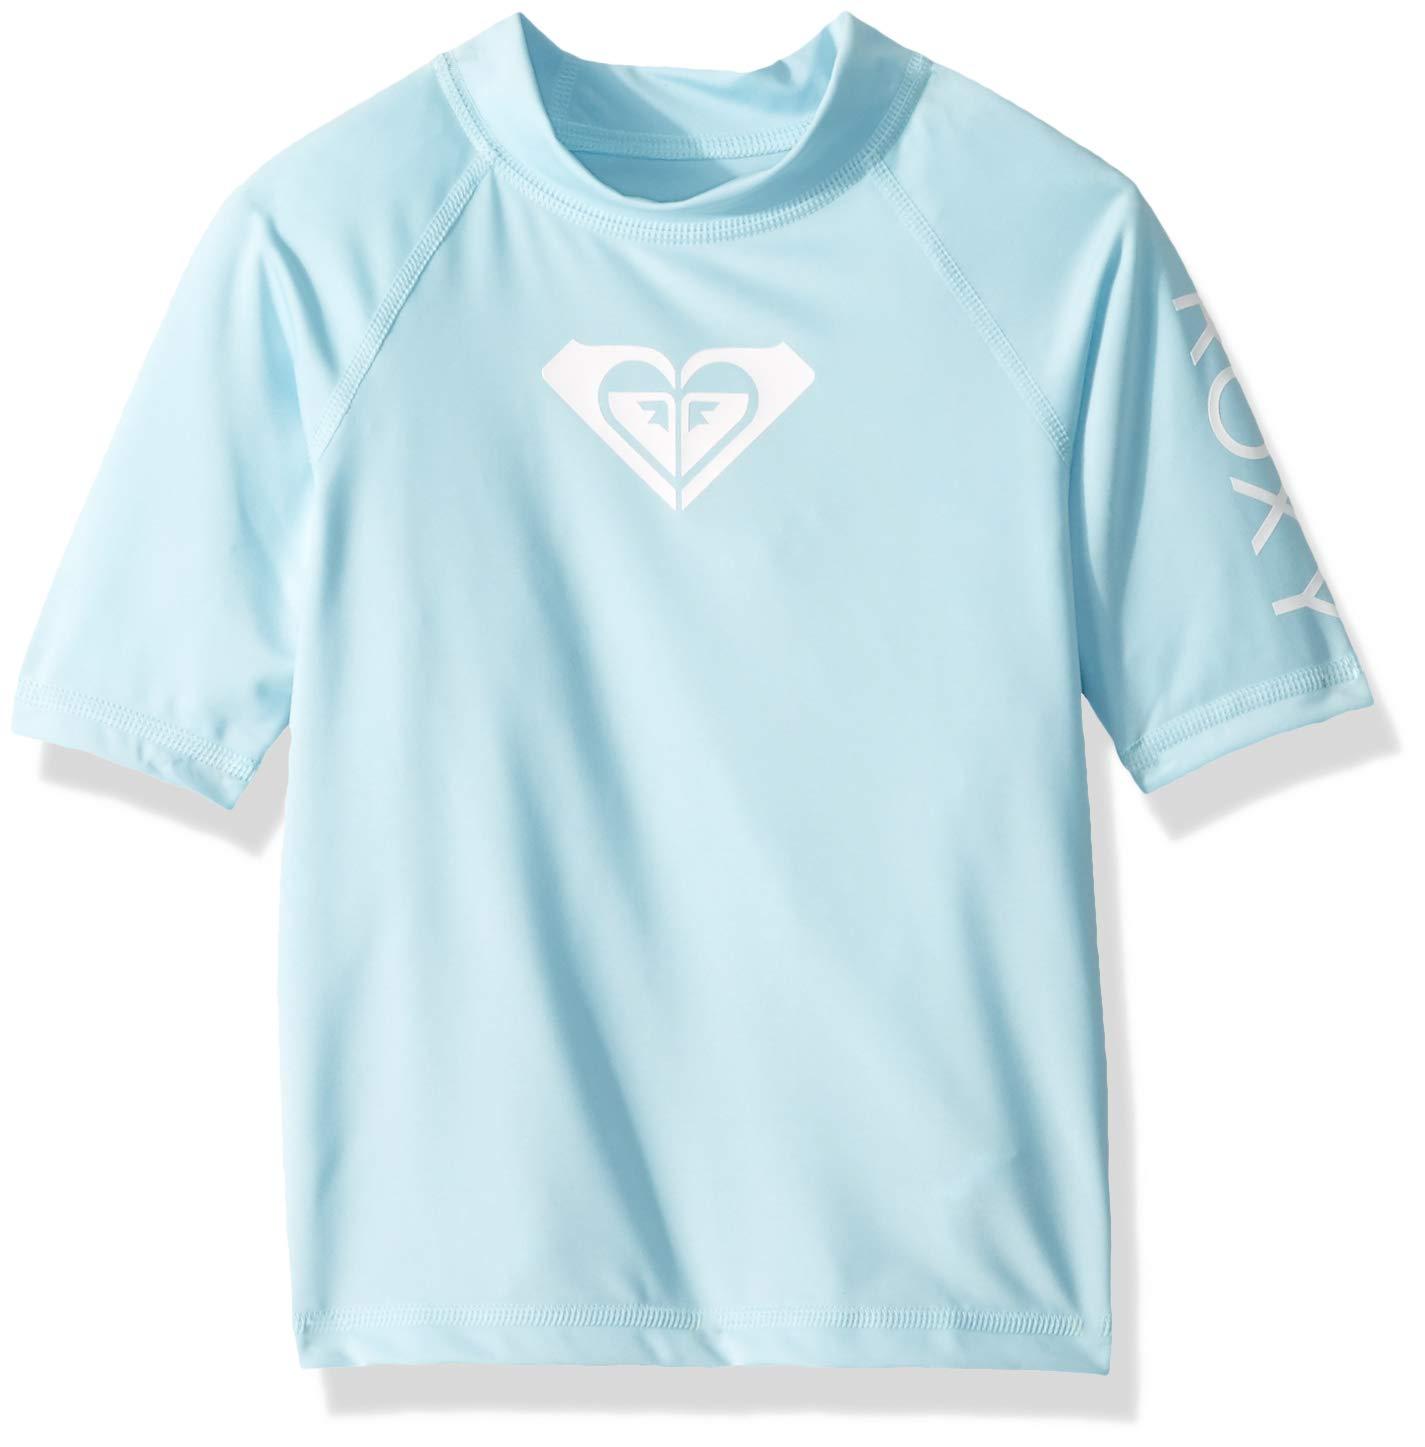 Roxy Toddler Girls' Whole Hearted Short Sleeve Rashguard, Crystal Blue, 2 by Roxy